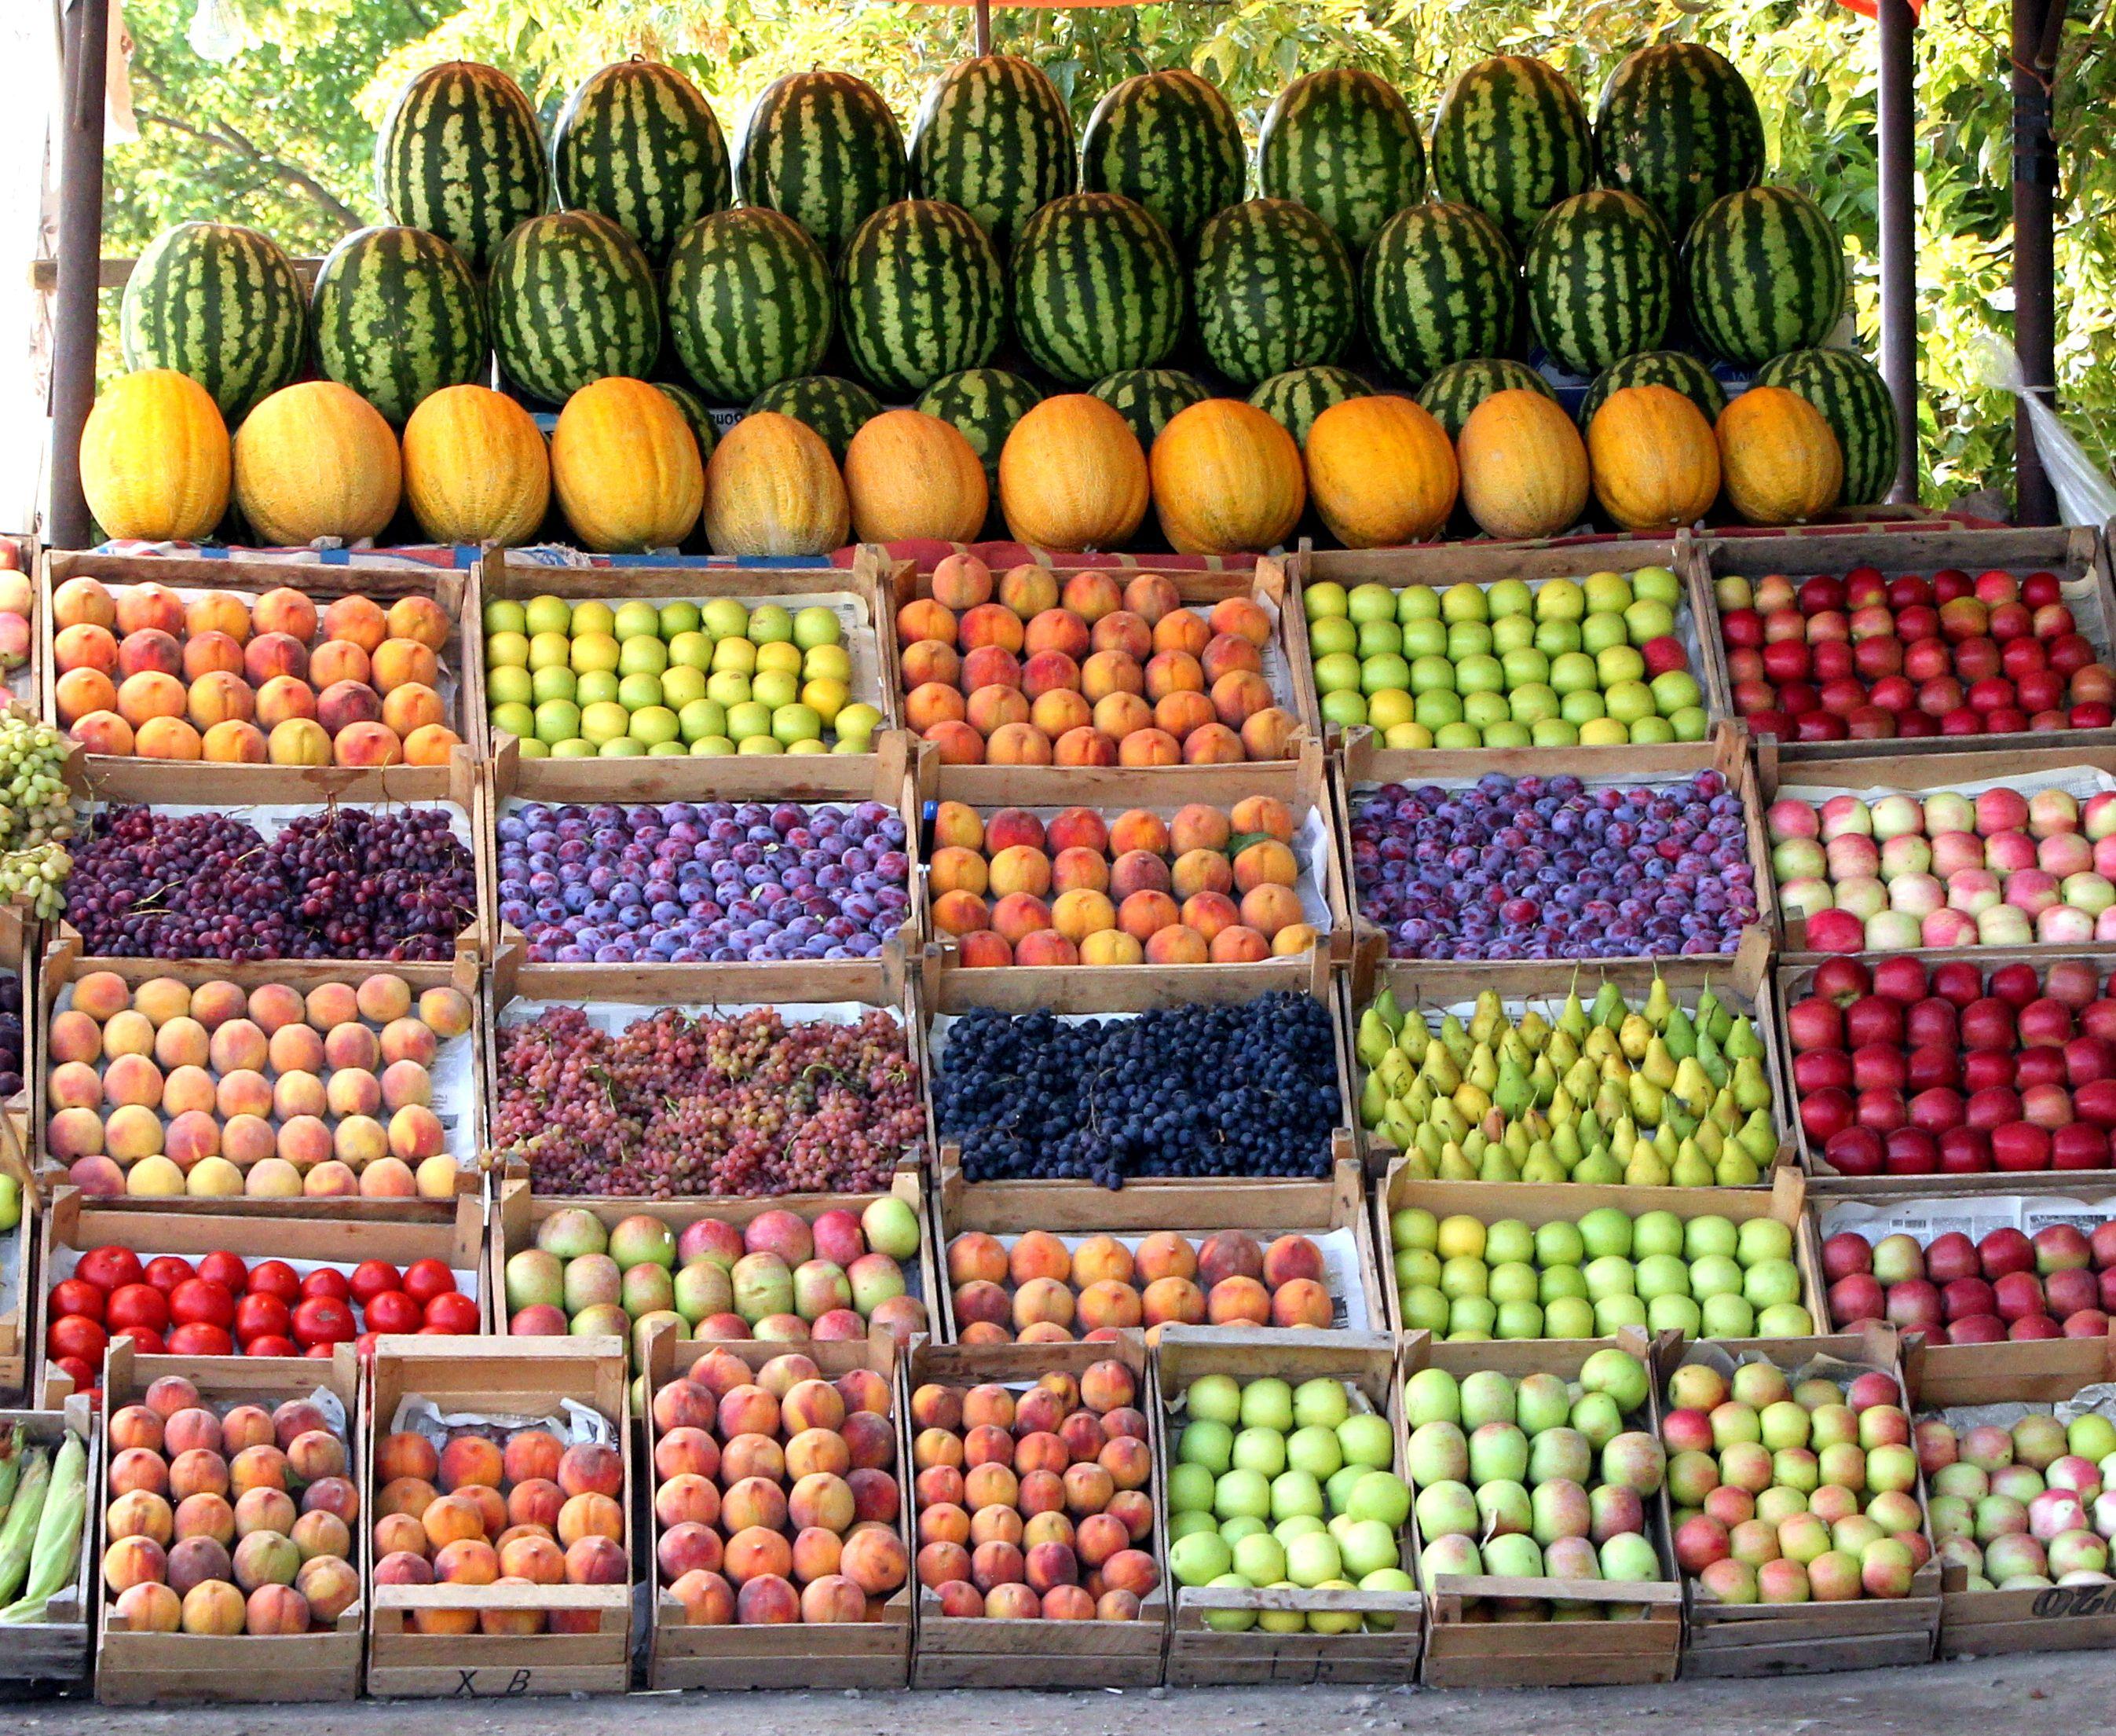 Fruit jpeg image 2694 2210 pixels scaled for Ararat armenian cuisine